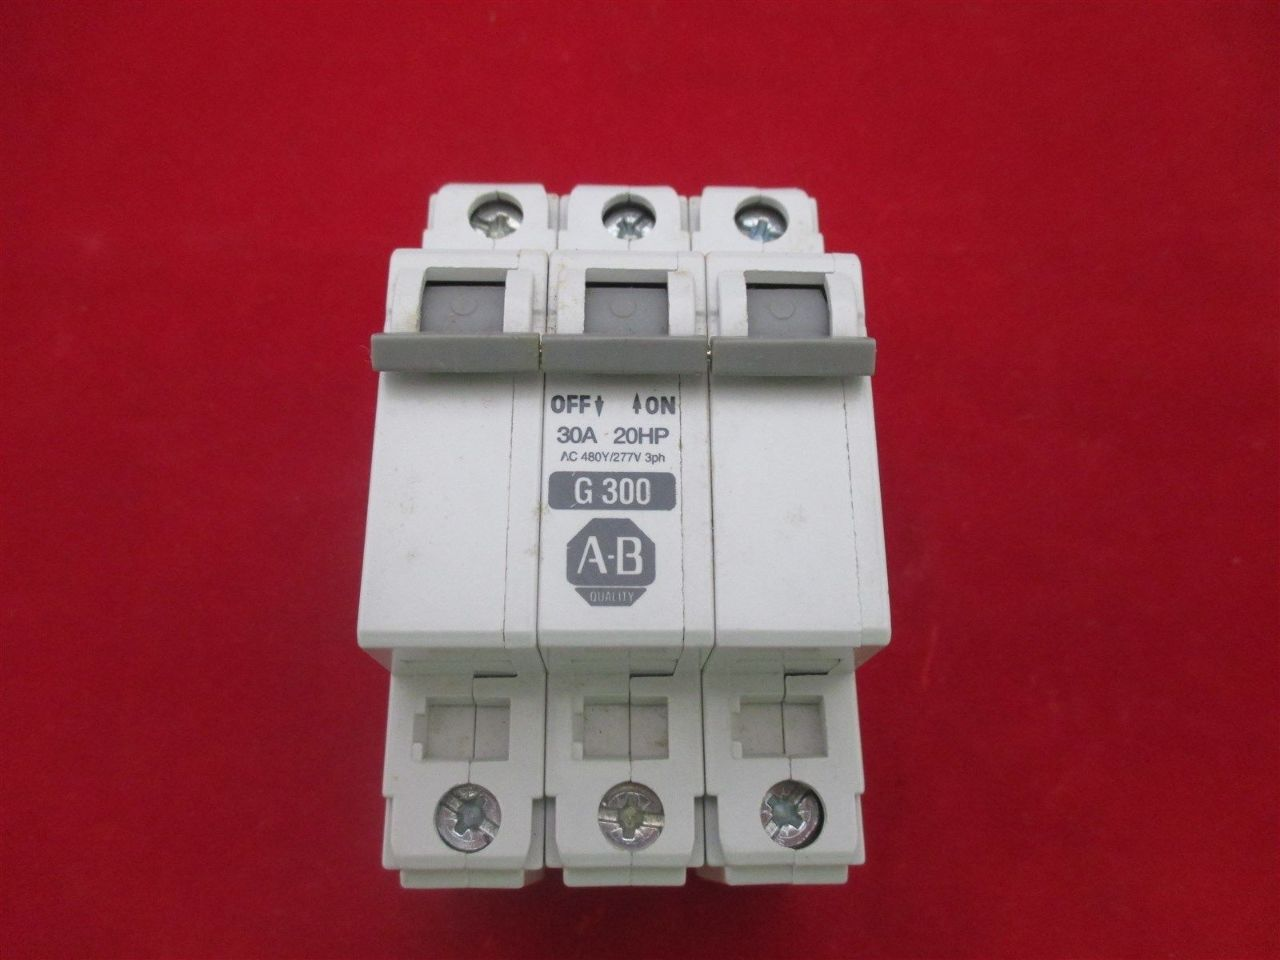 Allen Bradley Miniature Circuit Breaker 1492 Cb3 G300 Process Breakers Images Photos